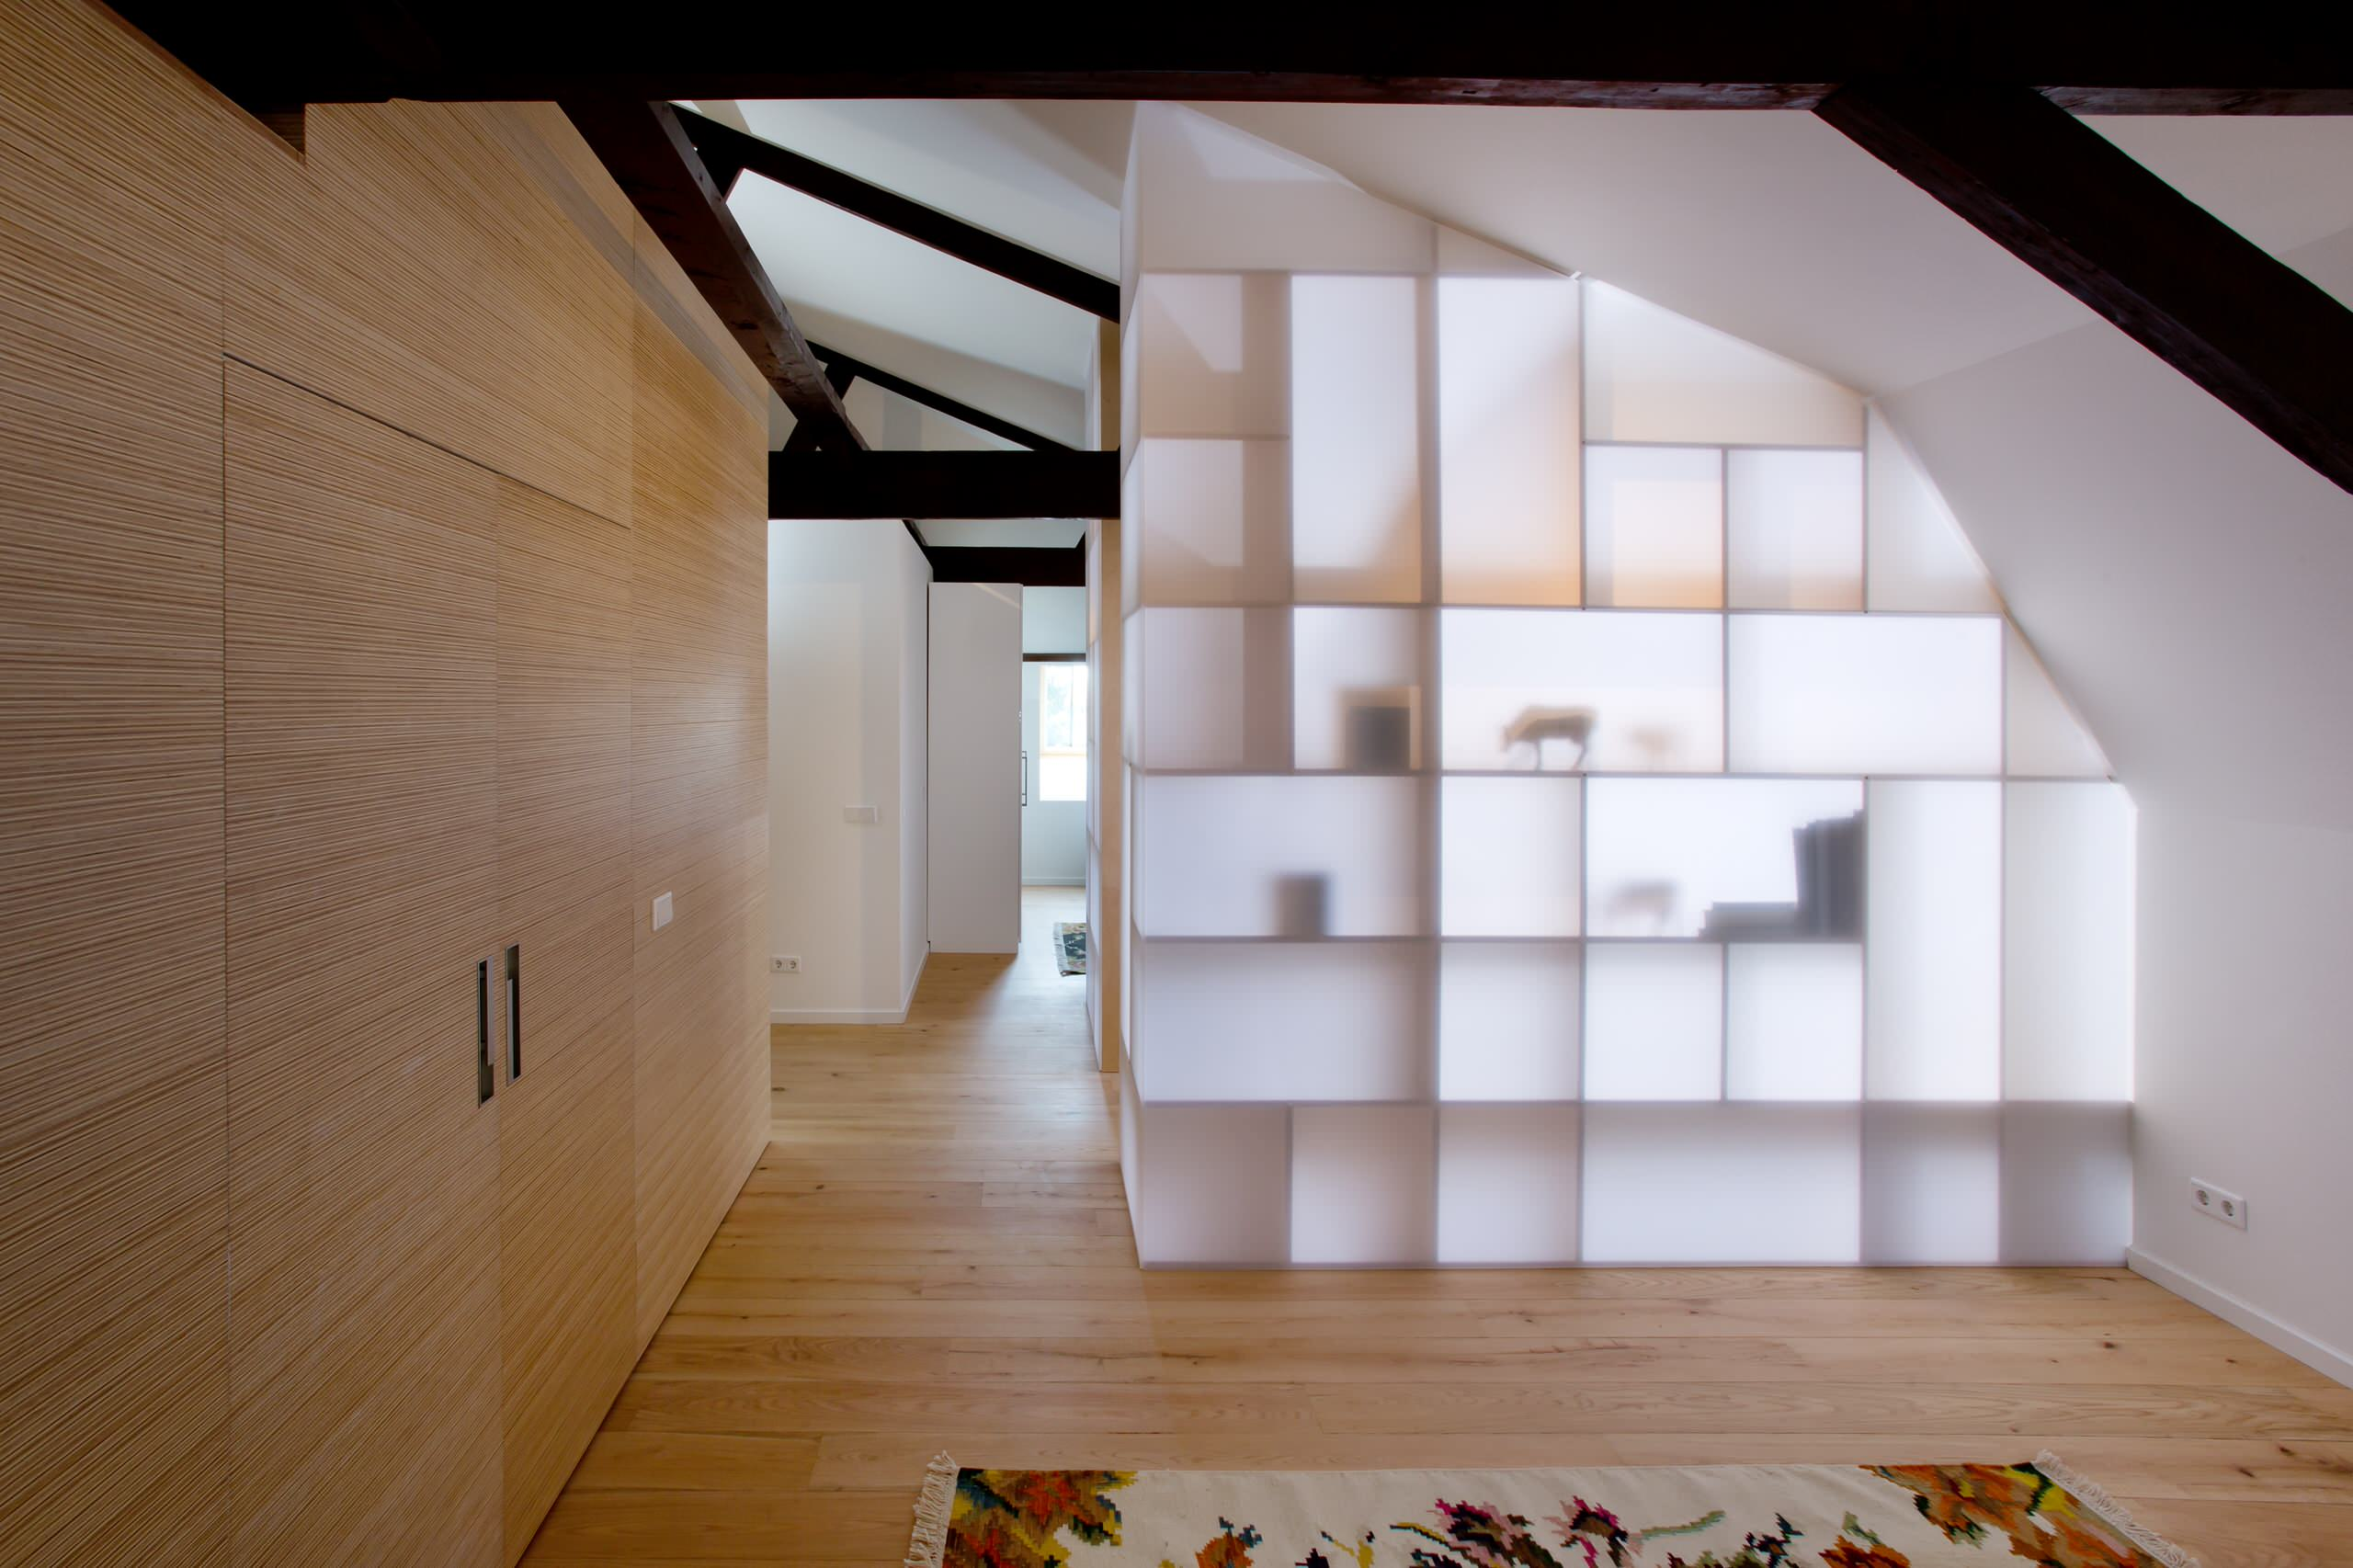 remarkable hallway storage furniture ideas | 20 Remarkable Modern Hallway Designs That Will Inspire You ...